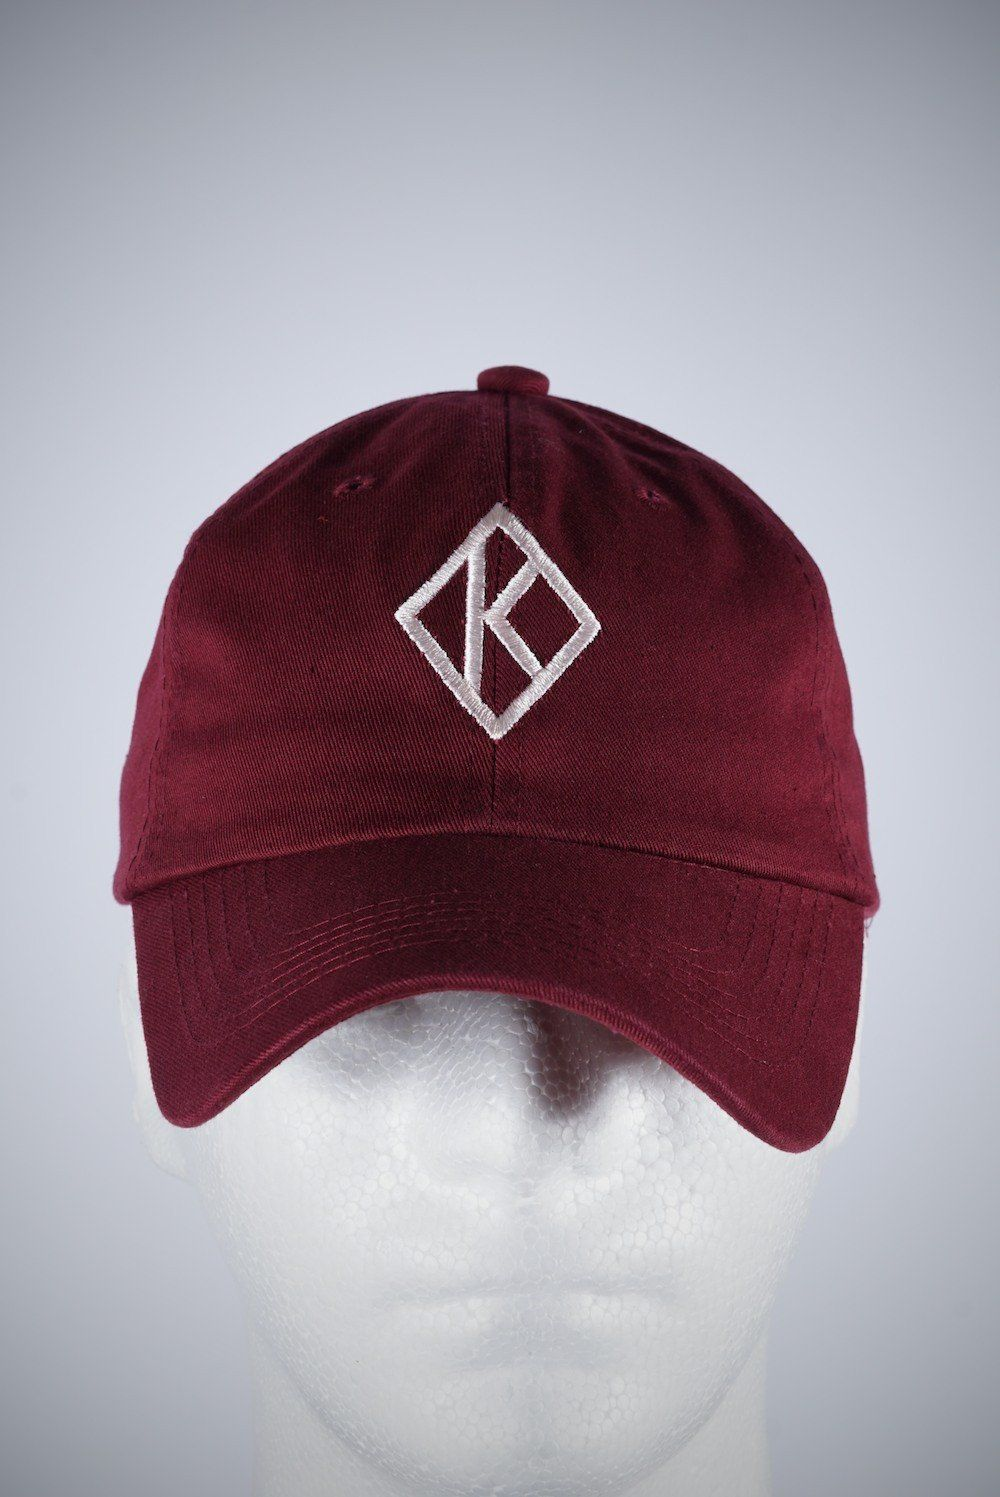 4548b843397a0 Diamond K Klassic polo dad hat